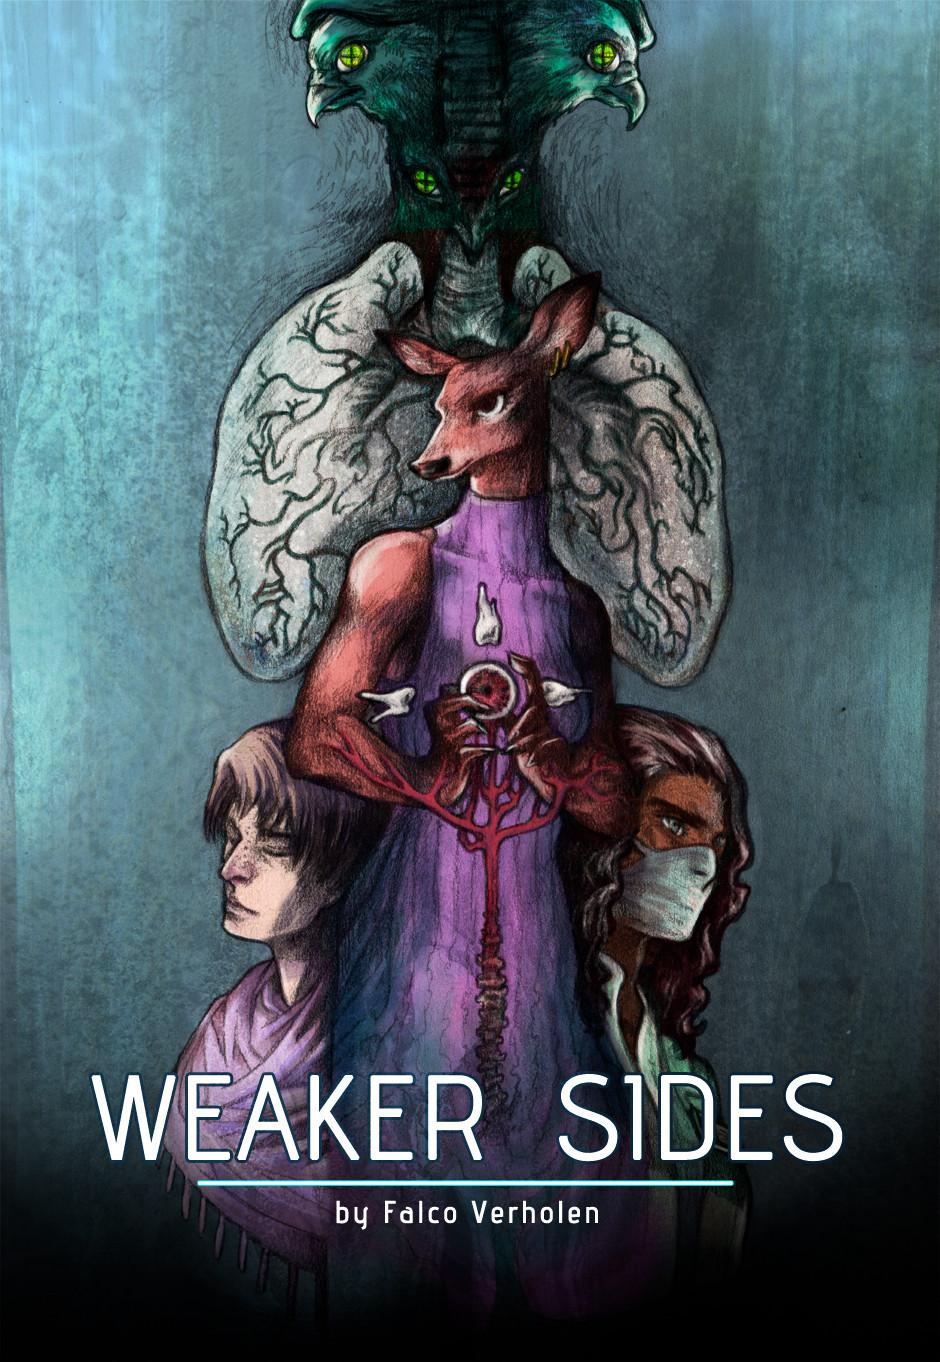 On Horror: Interview with Falco Verholen, Creator of Weaker Sides